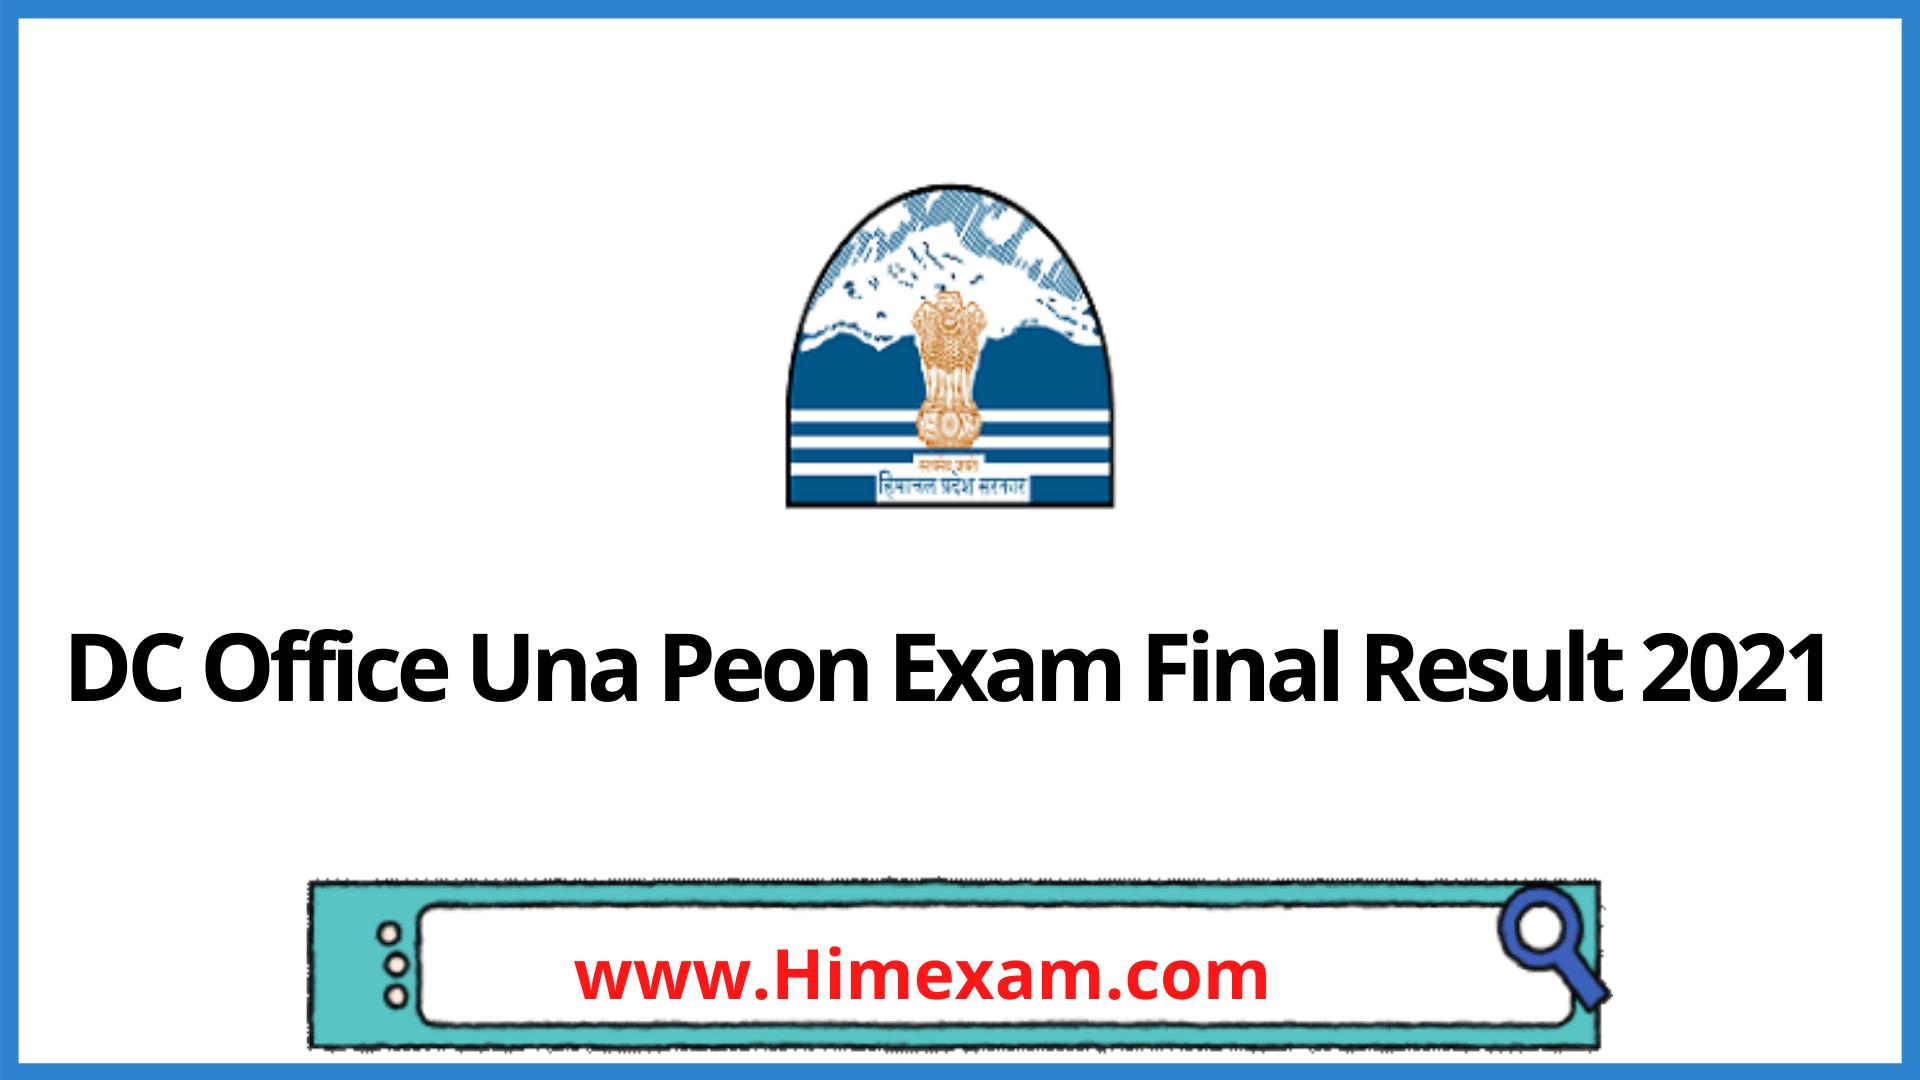 DC Office Una Peon Exam Final Result 2021